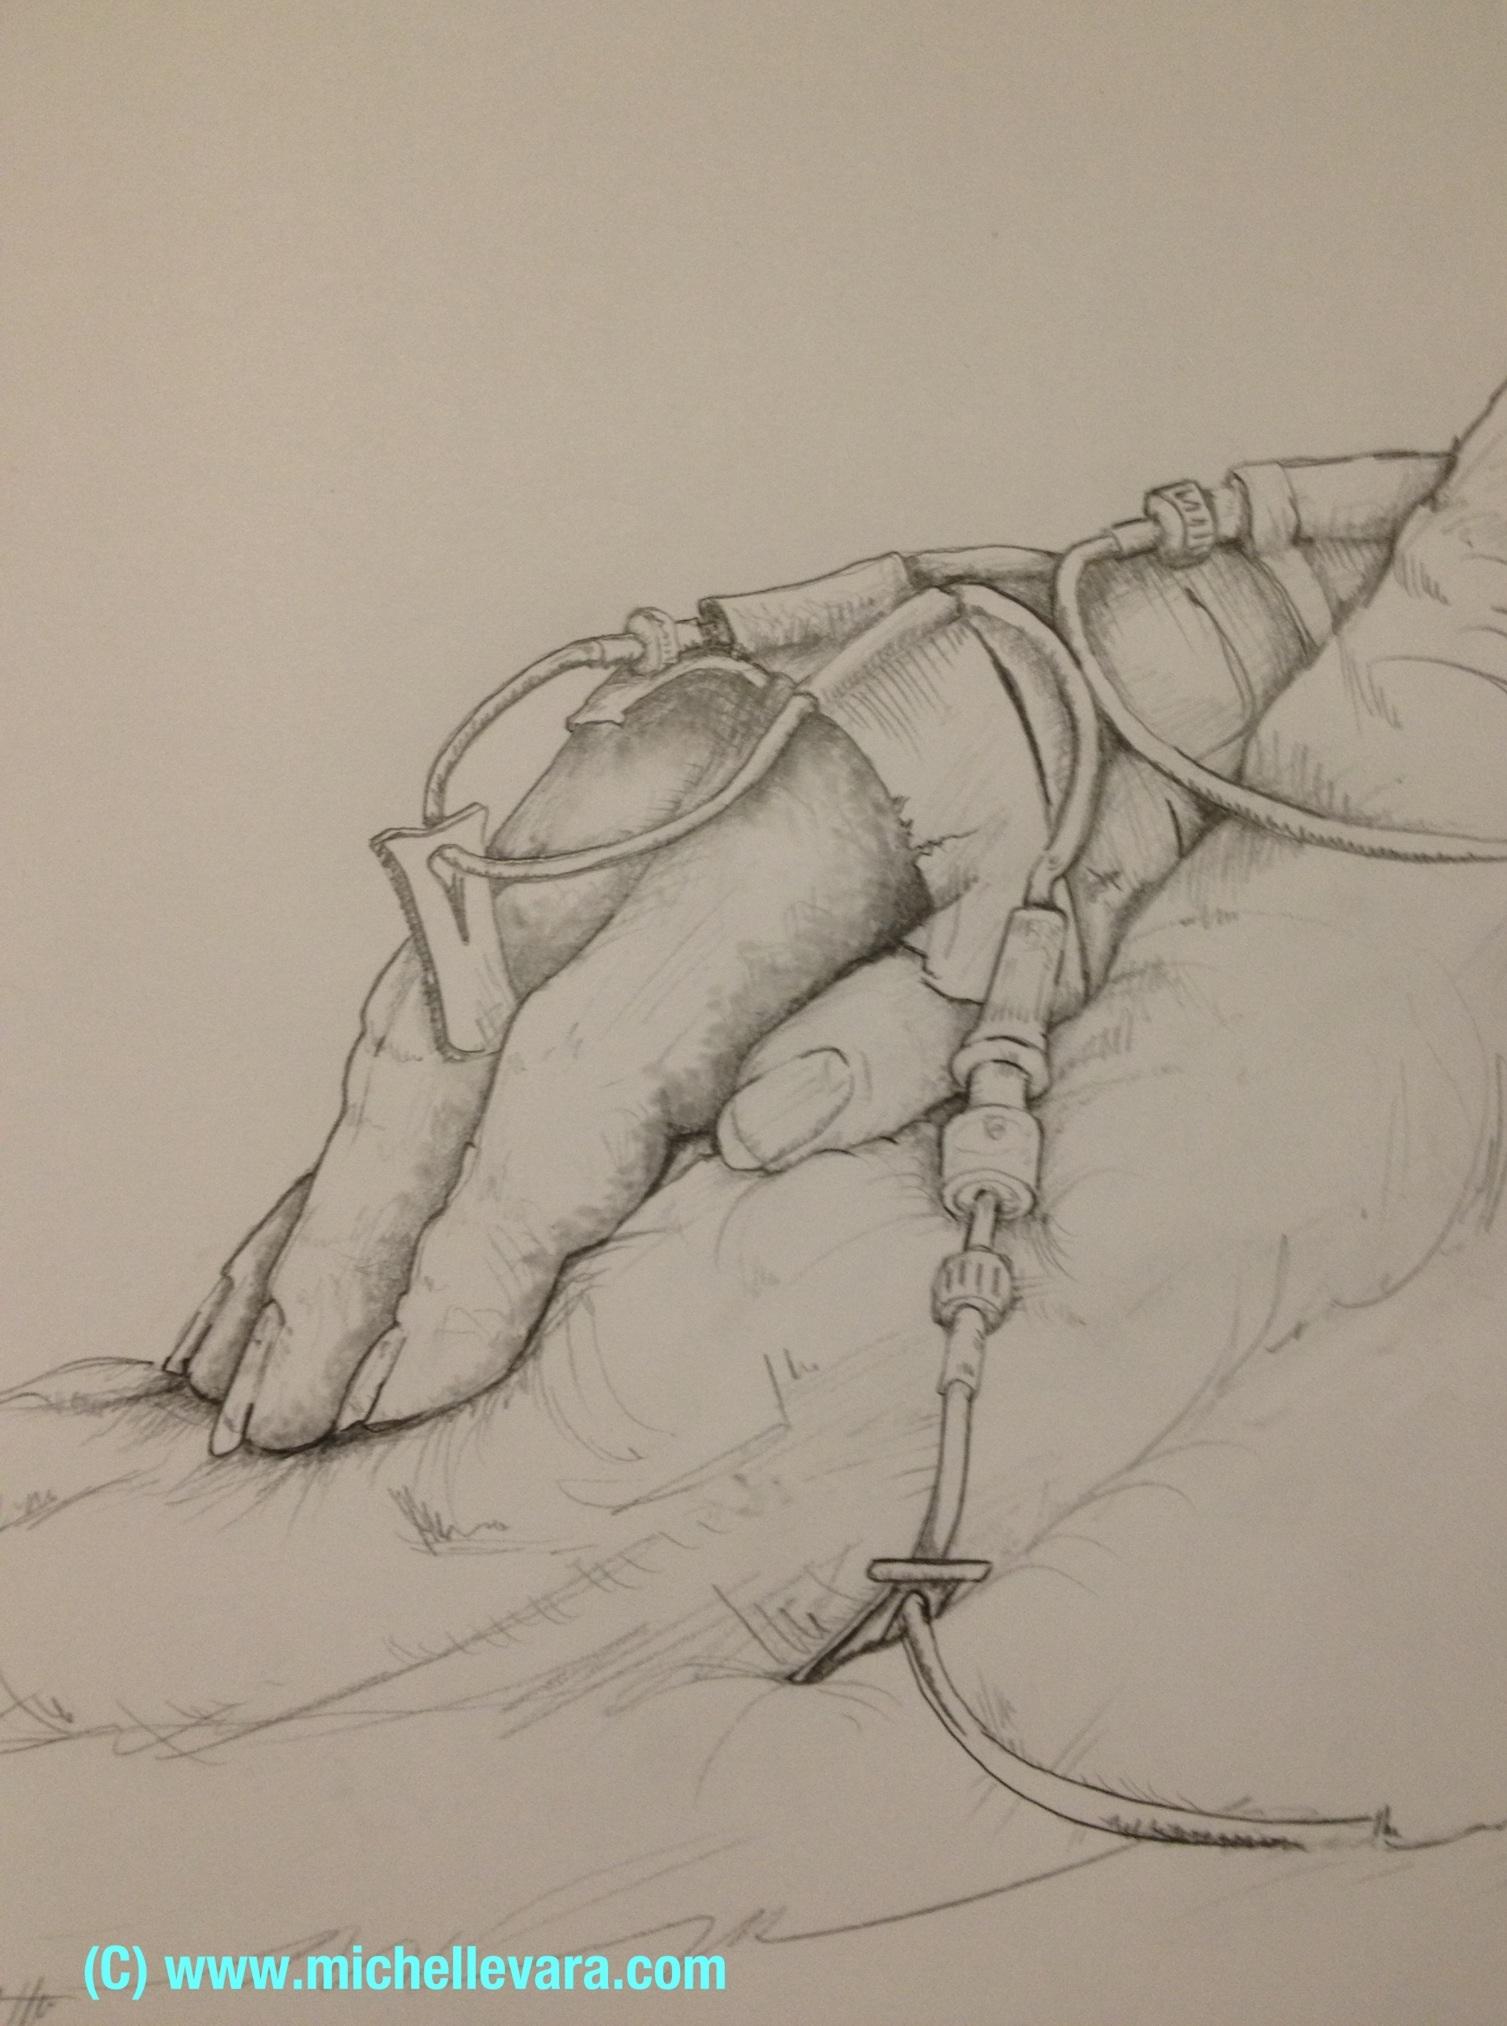 Medical art, Ohio, Cleveland clinic, pencils drawings, Michelle vara, Ballard rd art studio,